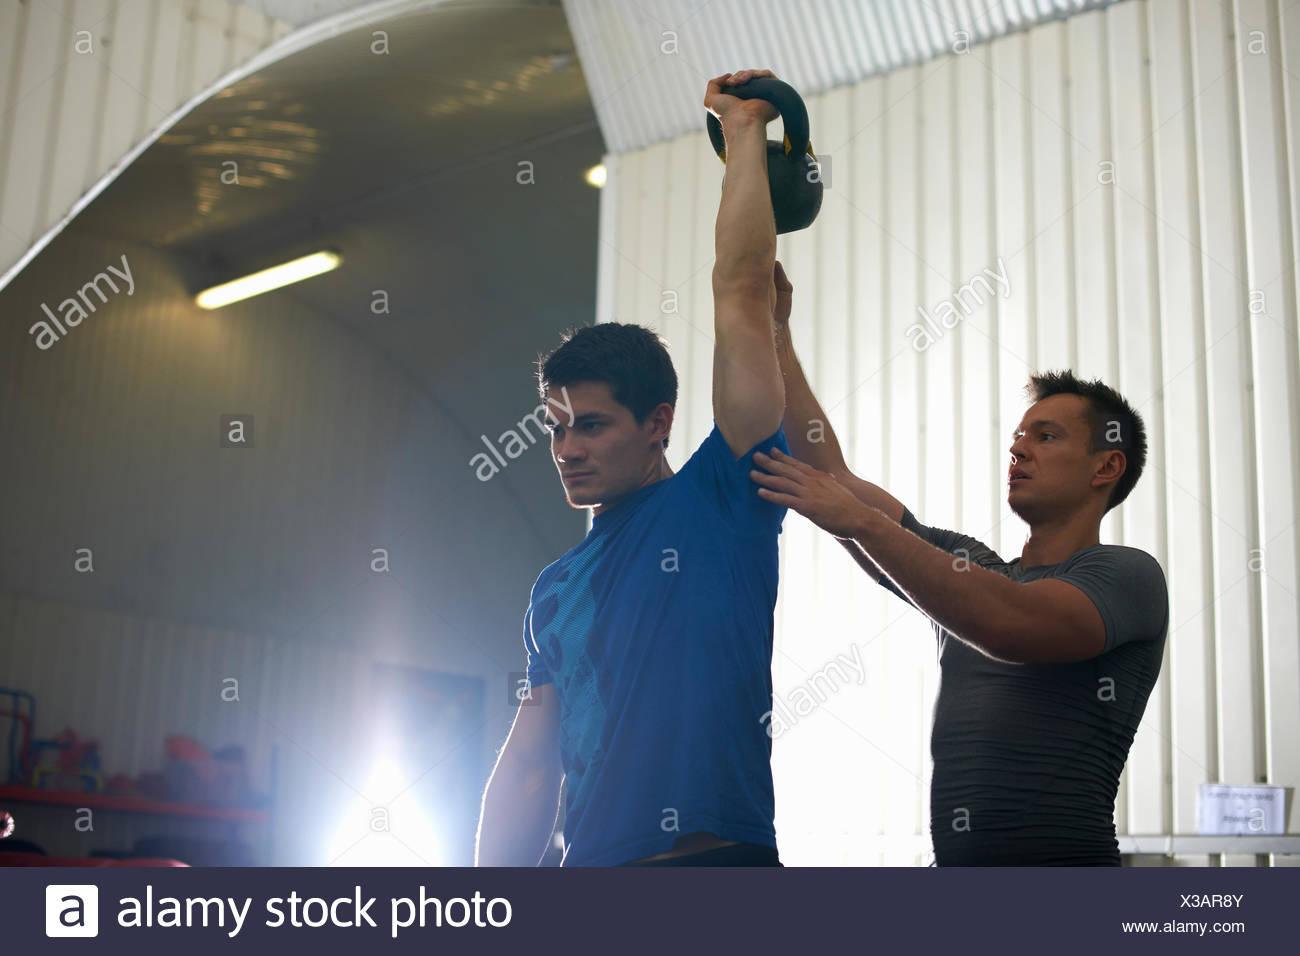 Trainer coaching uomo con kettlebell in palestra Immagini Stock